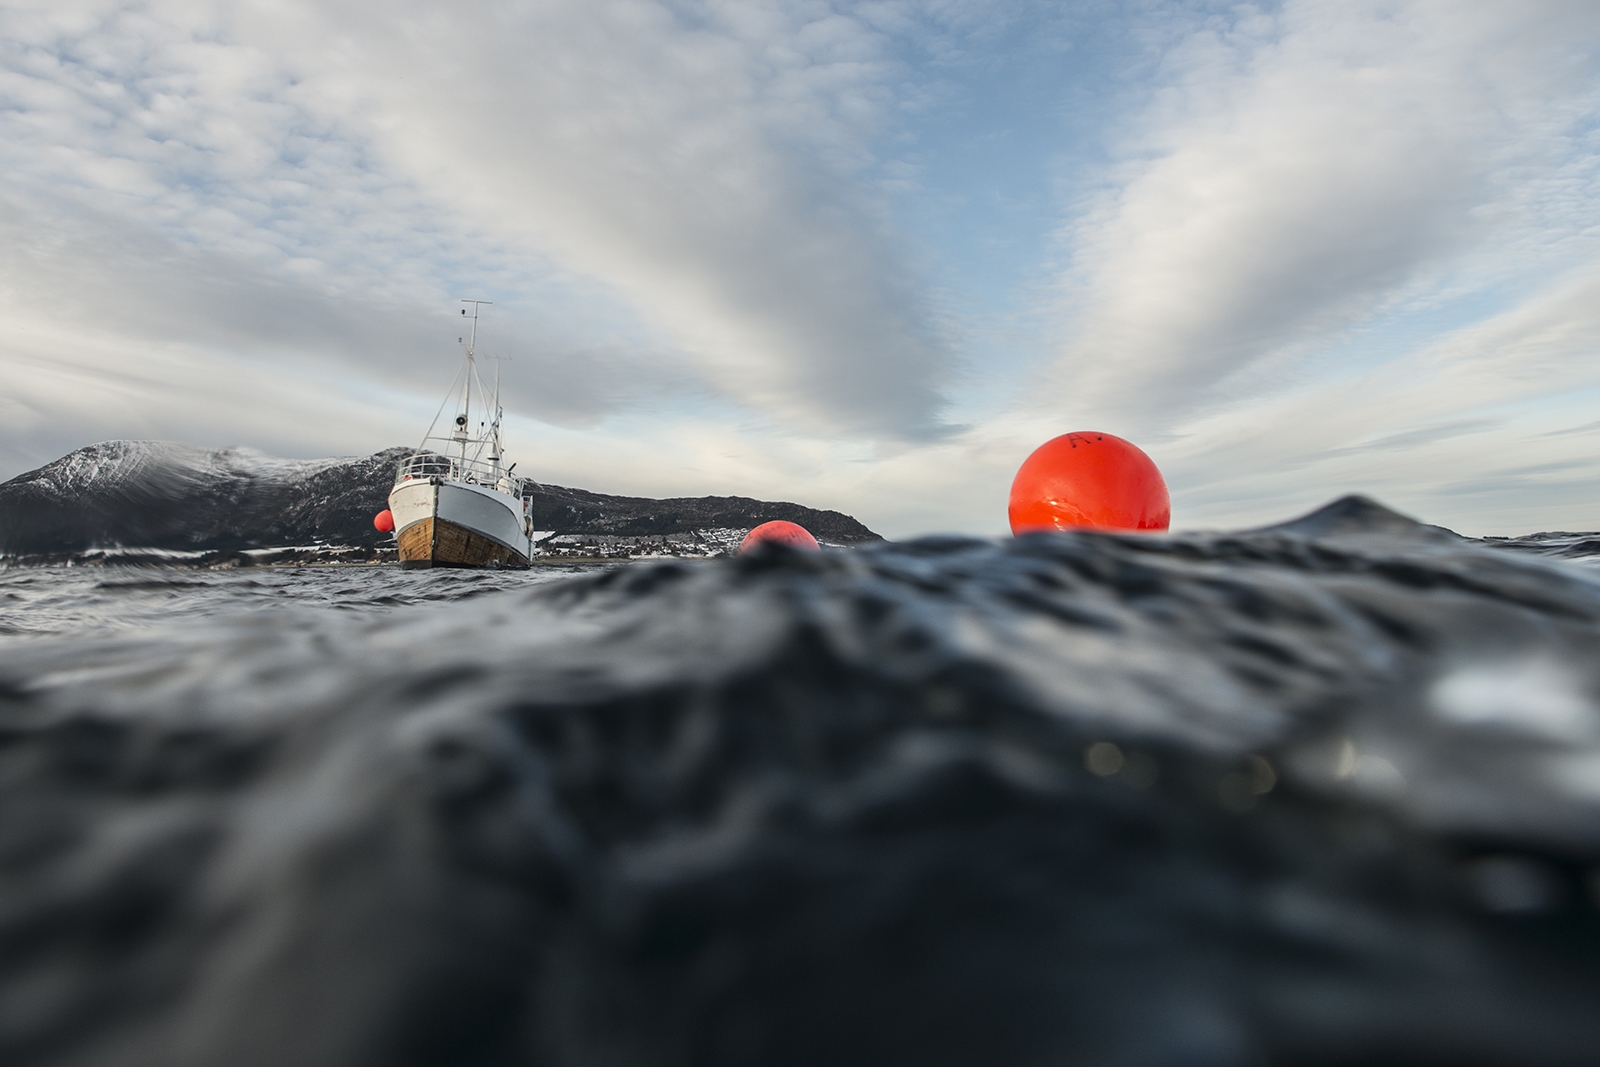 Polyform buoy with Actin Adventure boat (c) vasco pinhol, 2018